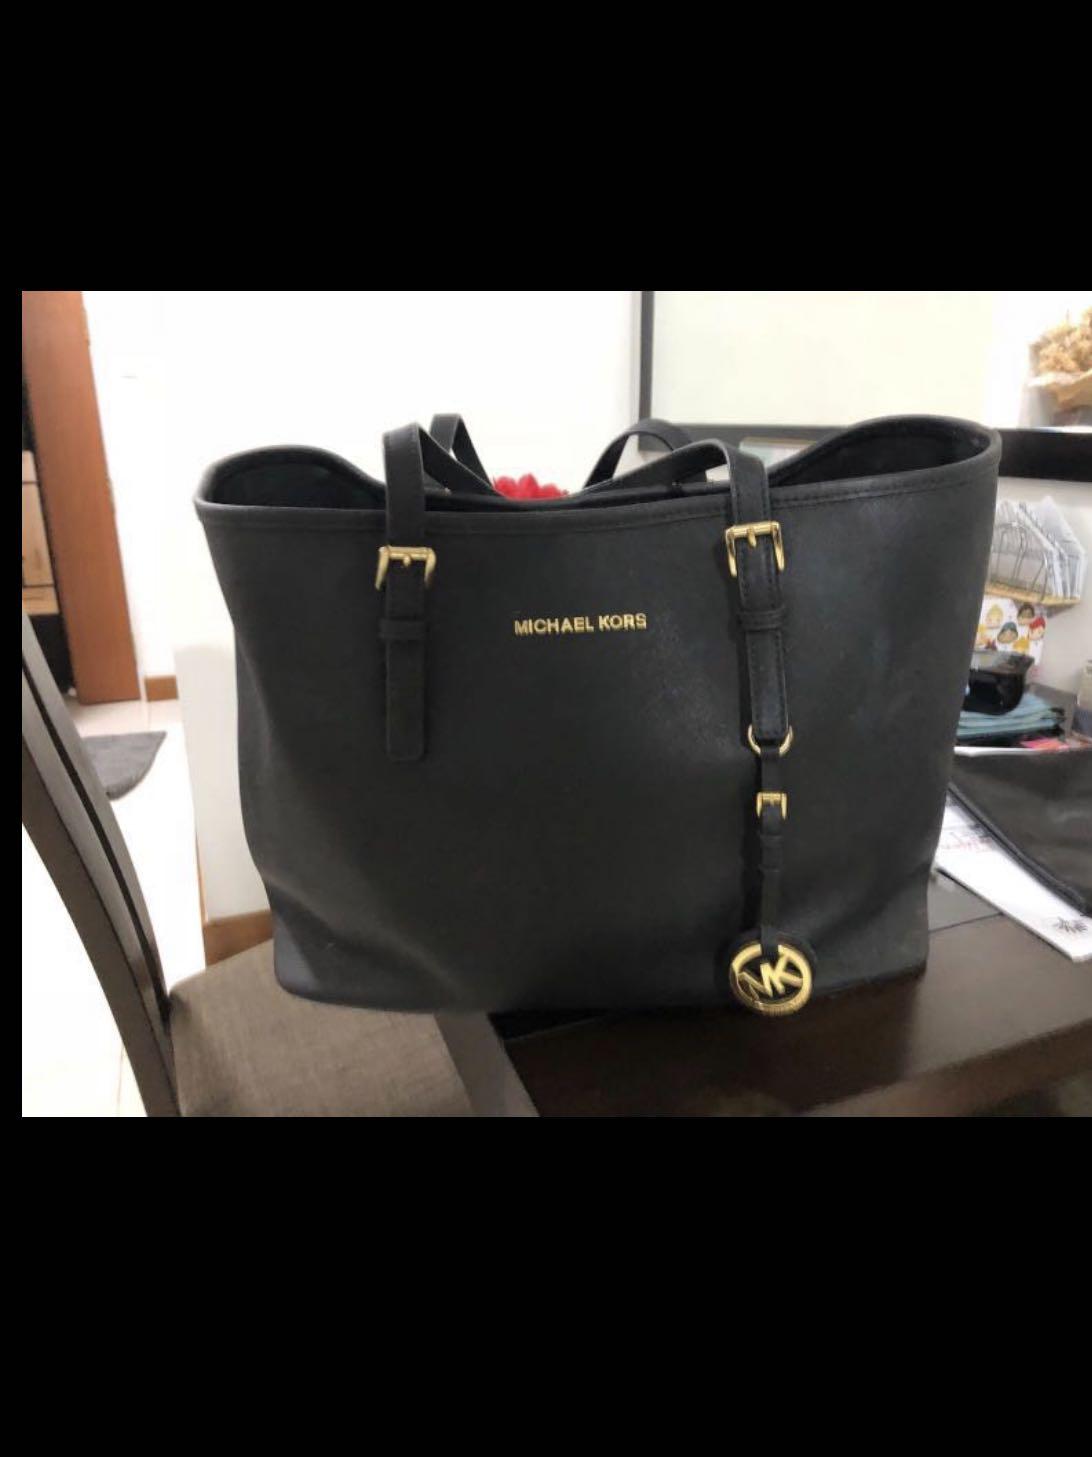 646fa6613971a0 Michael Kors Bag, Luxury, Bags & Wallets, Handbags on Carousell